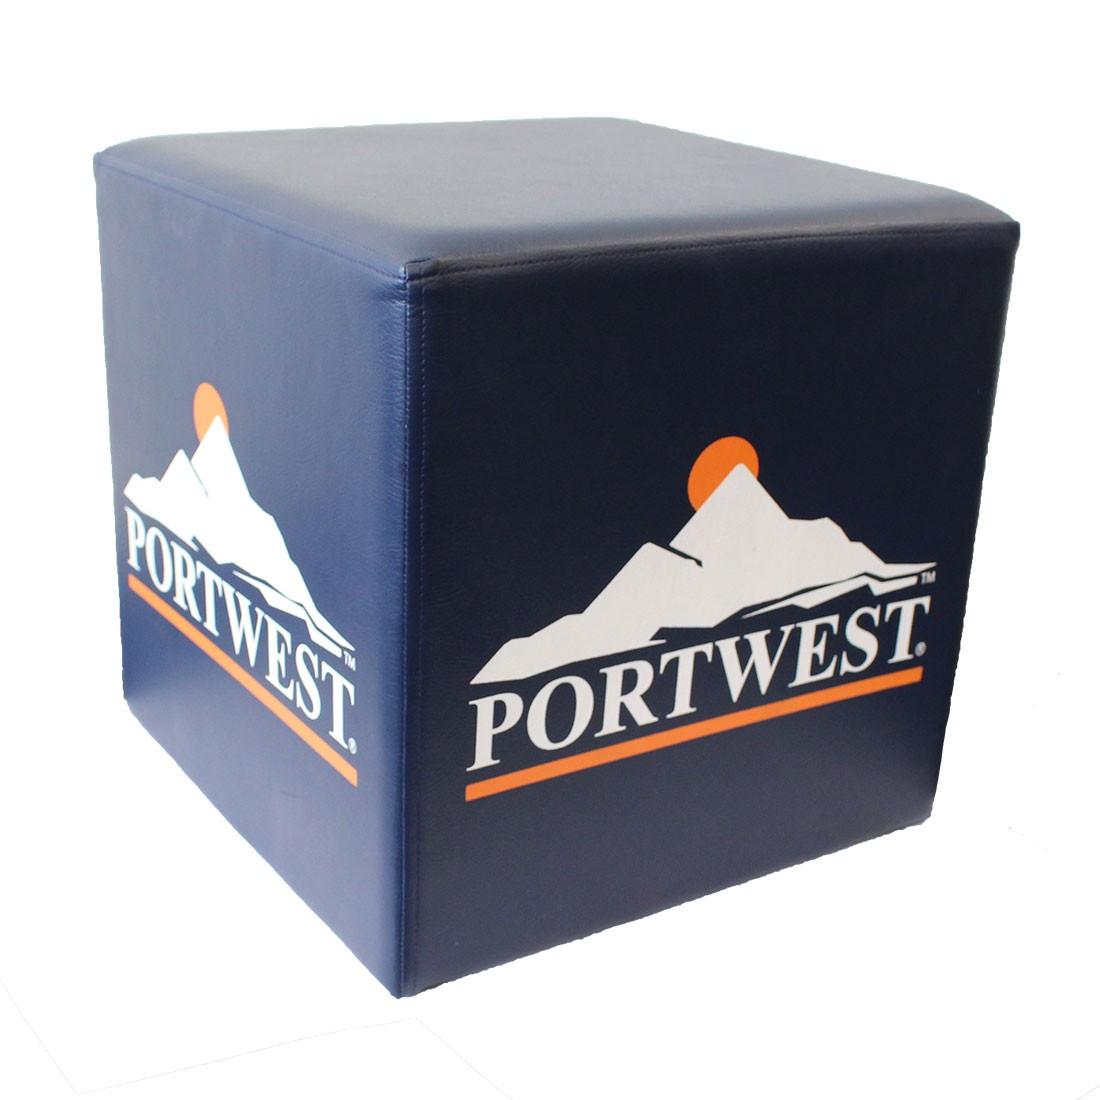 Portwest Poef